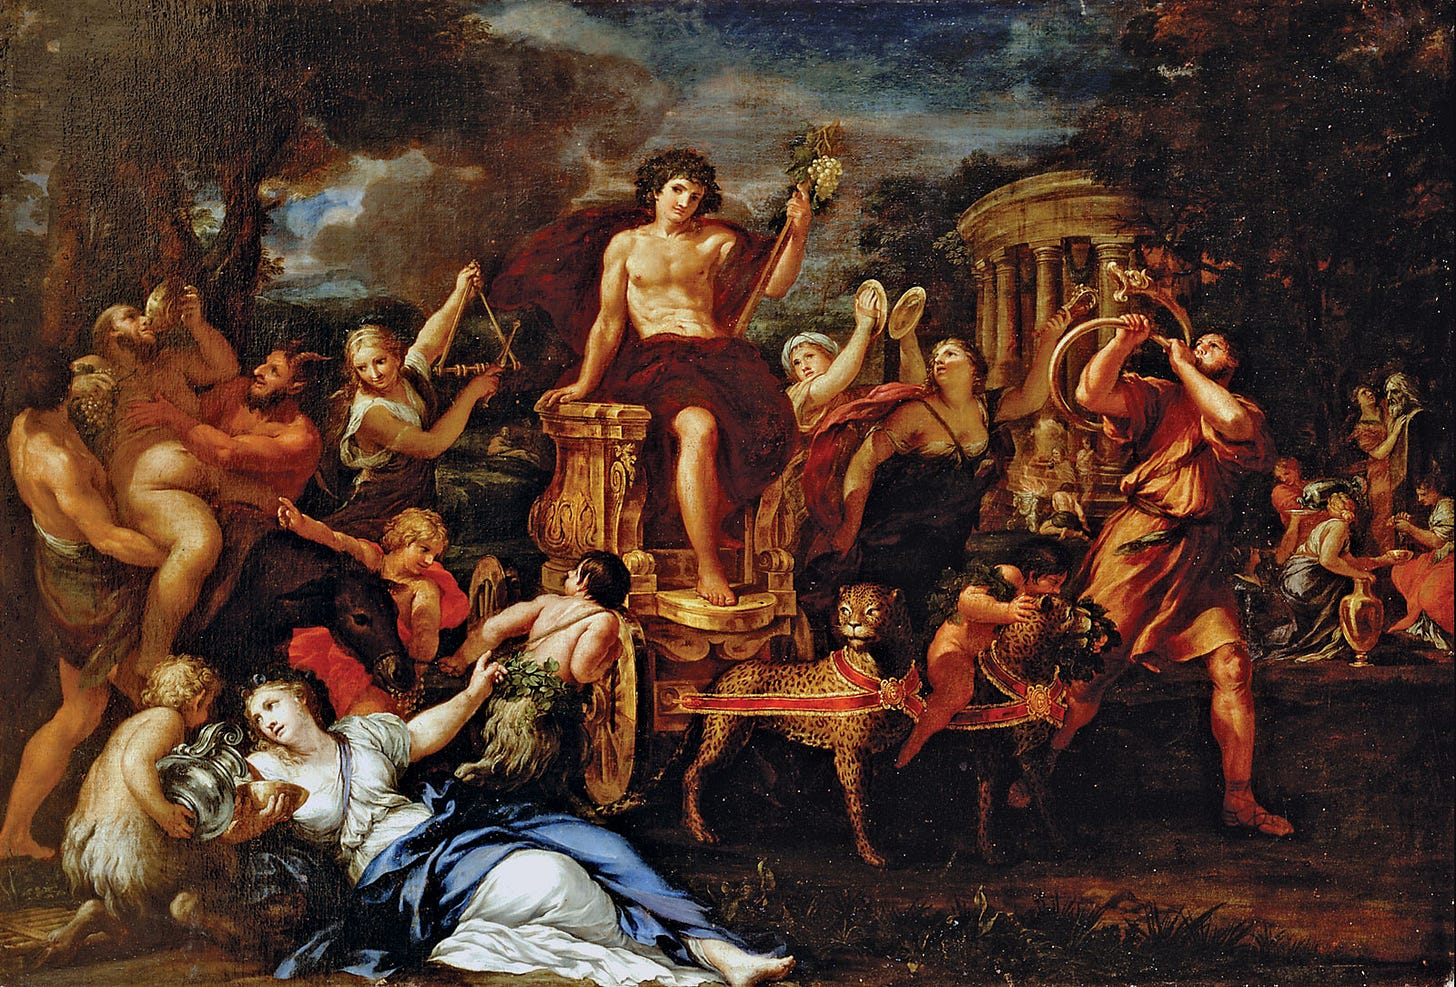 Dionysus | Powers, Personality, Symbols, & Facts | Britannica